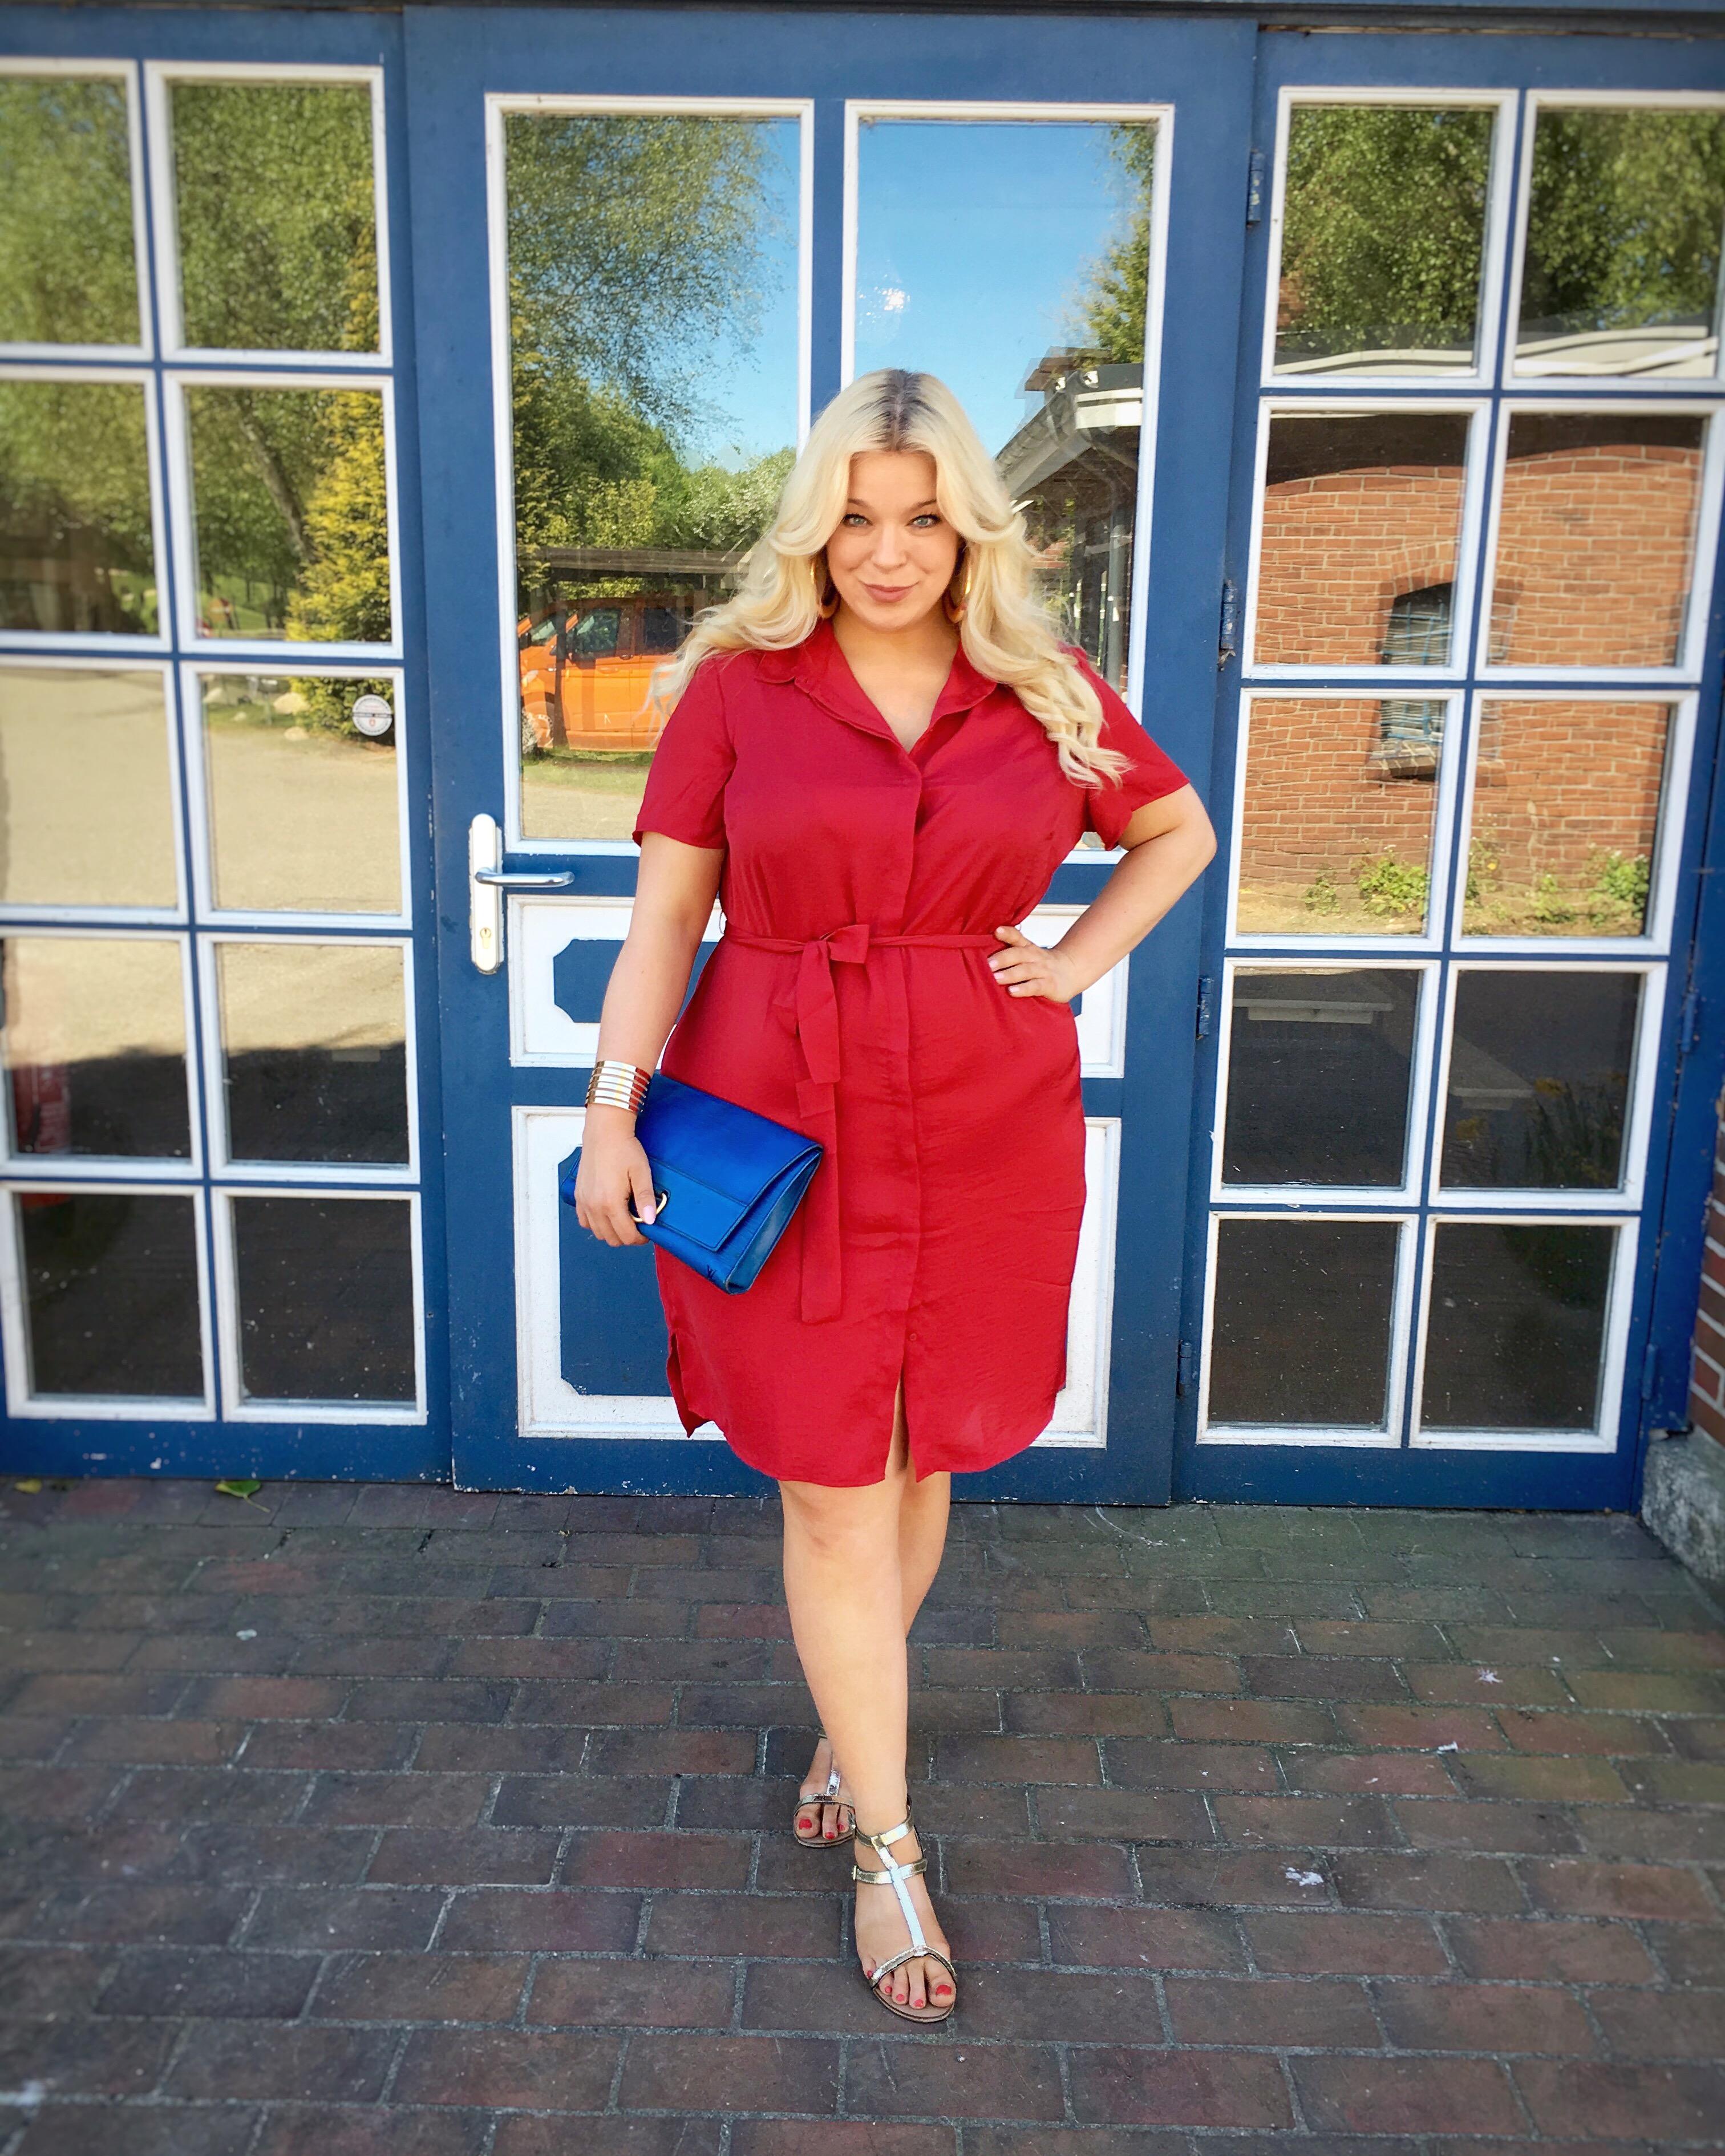 Caterina-pogorzelski-Hochzeitsgast-Plussize-Curvy-Megabambi-Blog